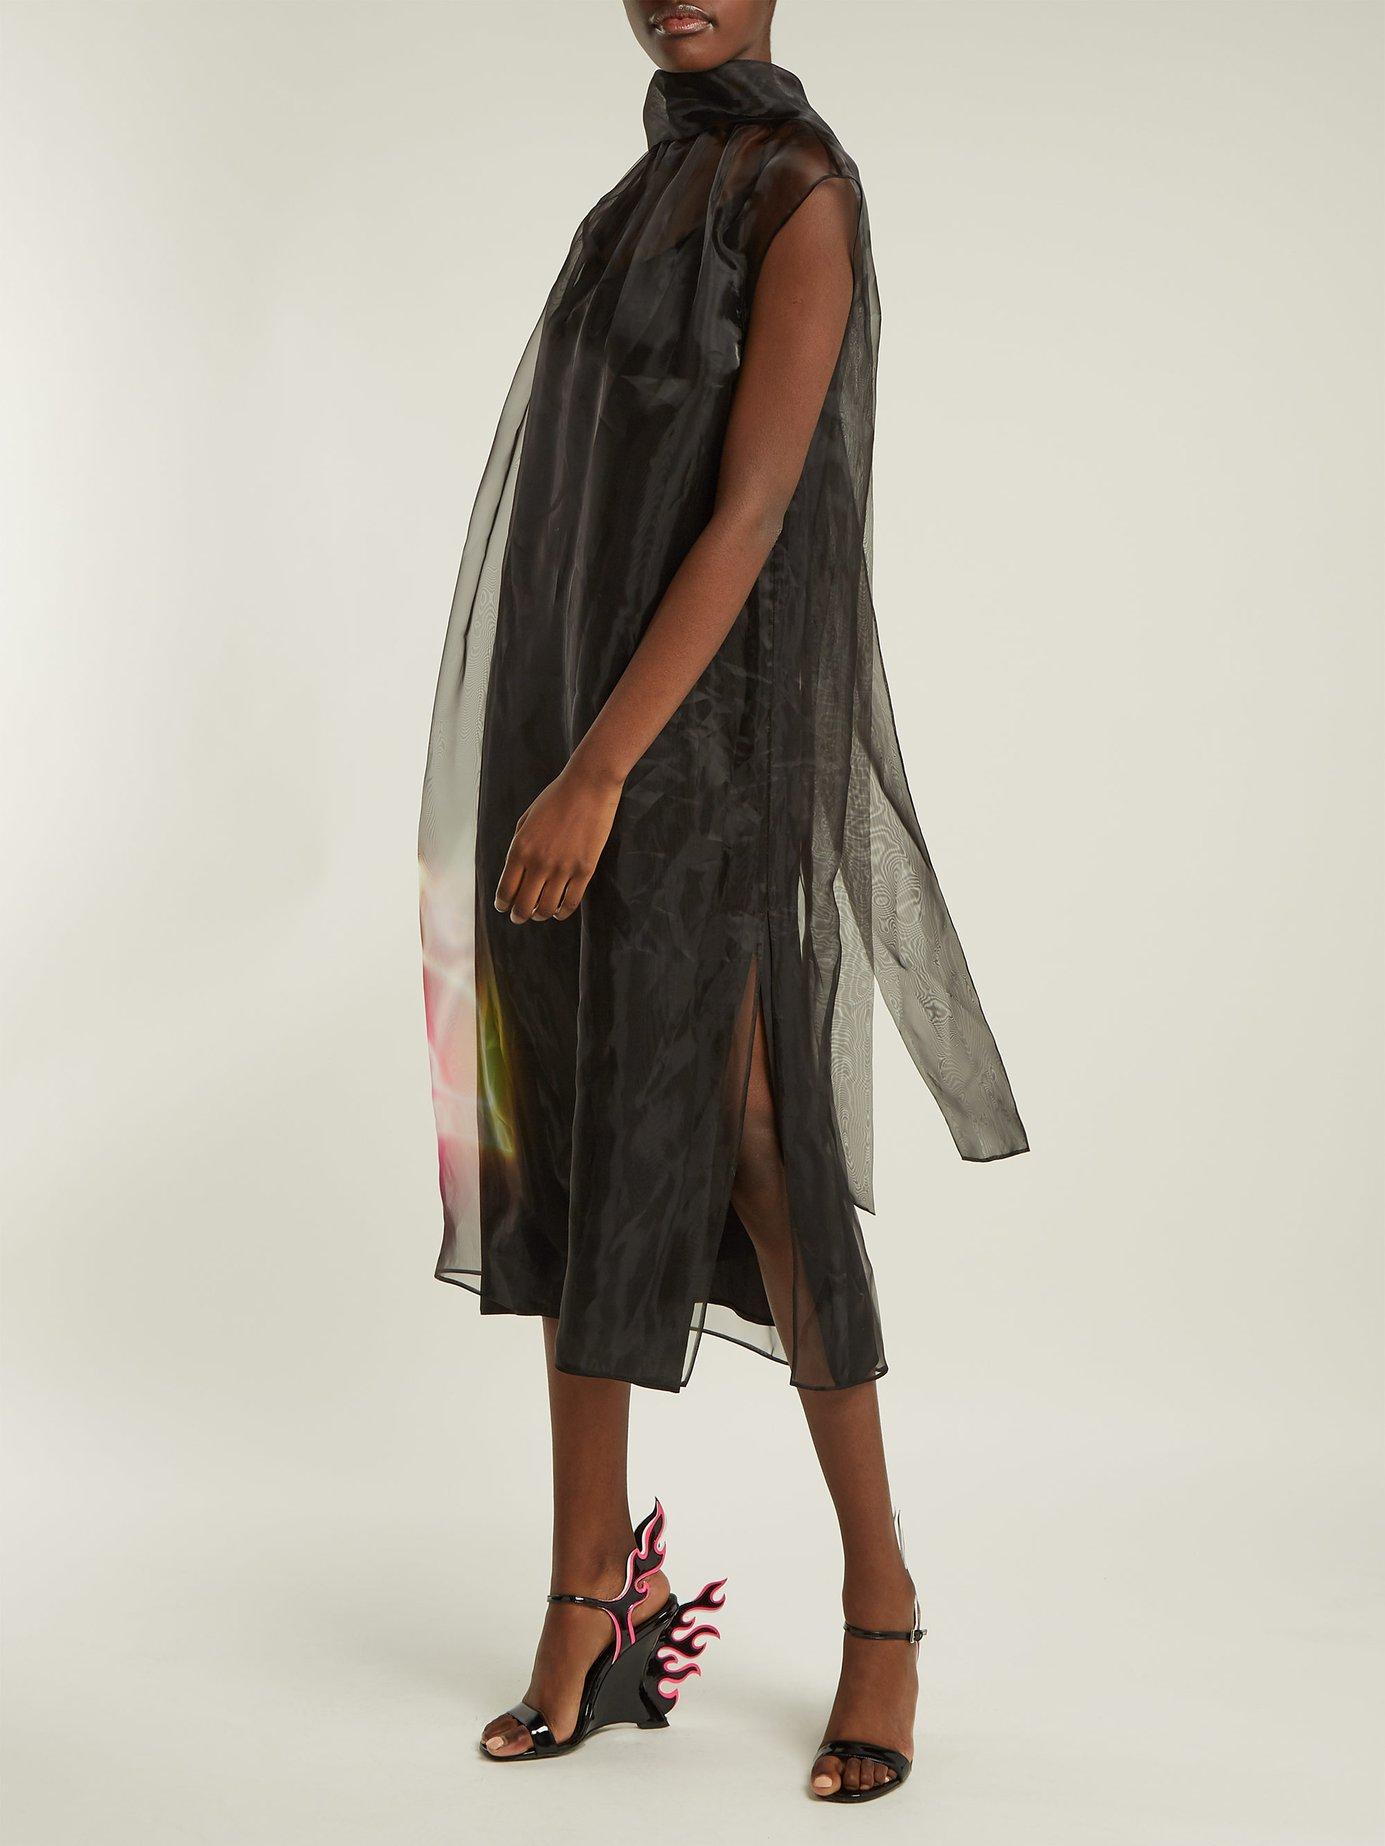 Neon rabbit-print silk-organza dress by Prada